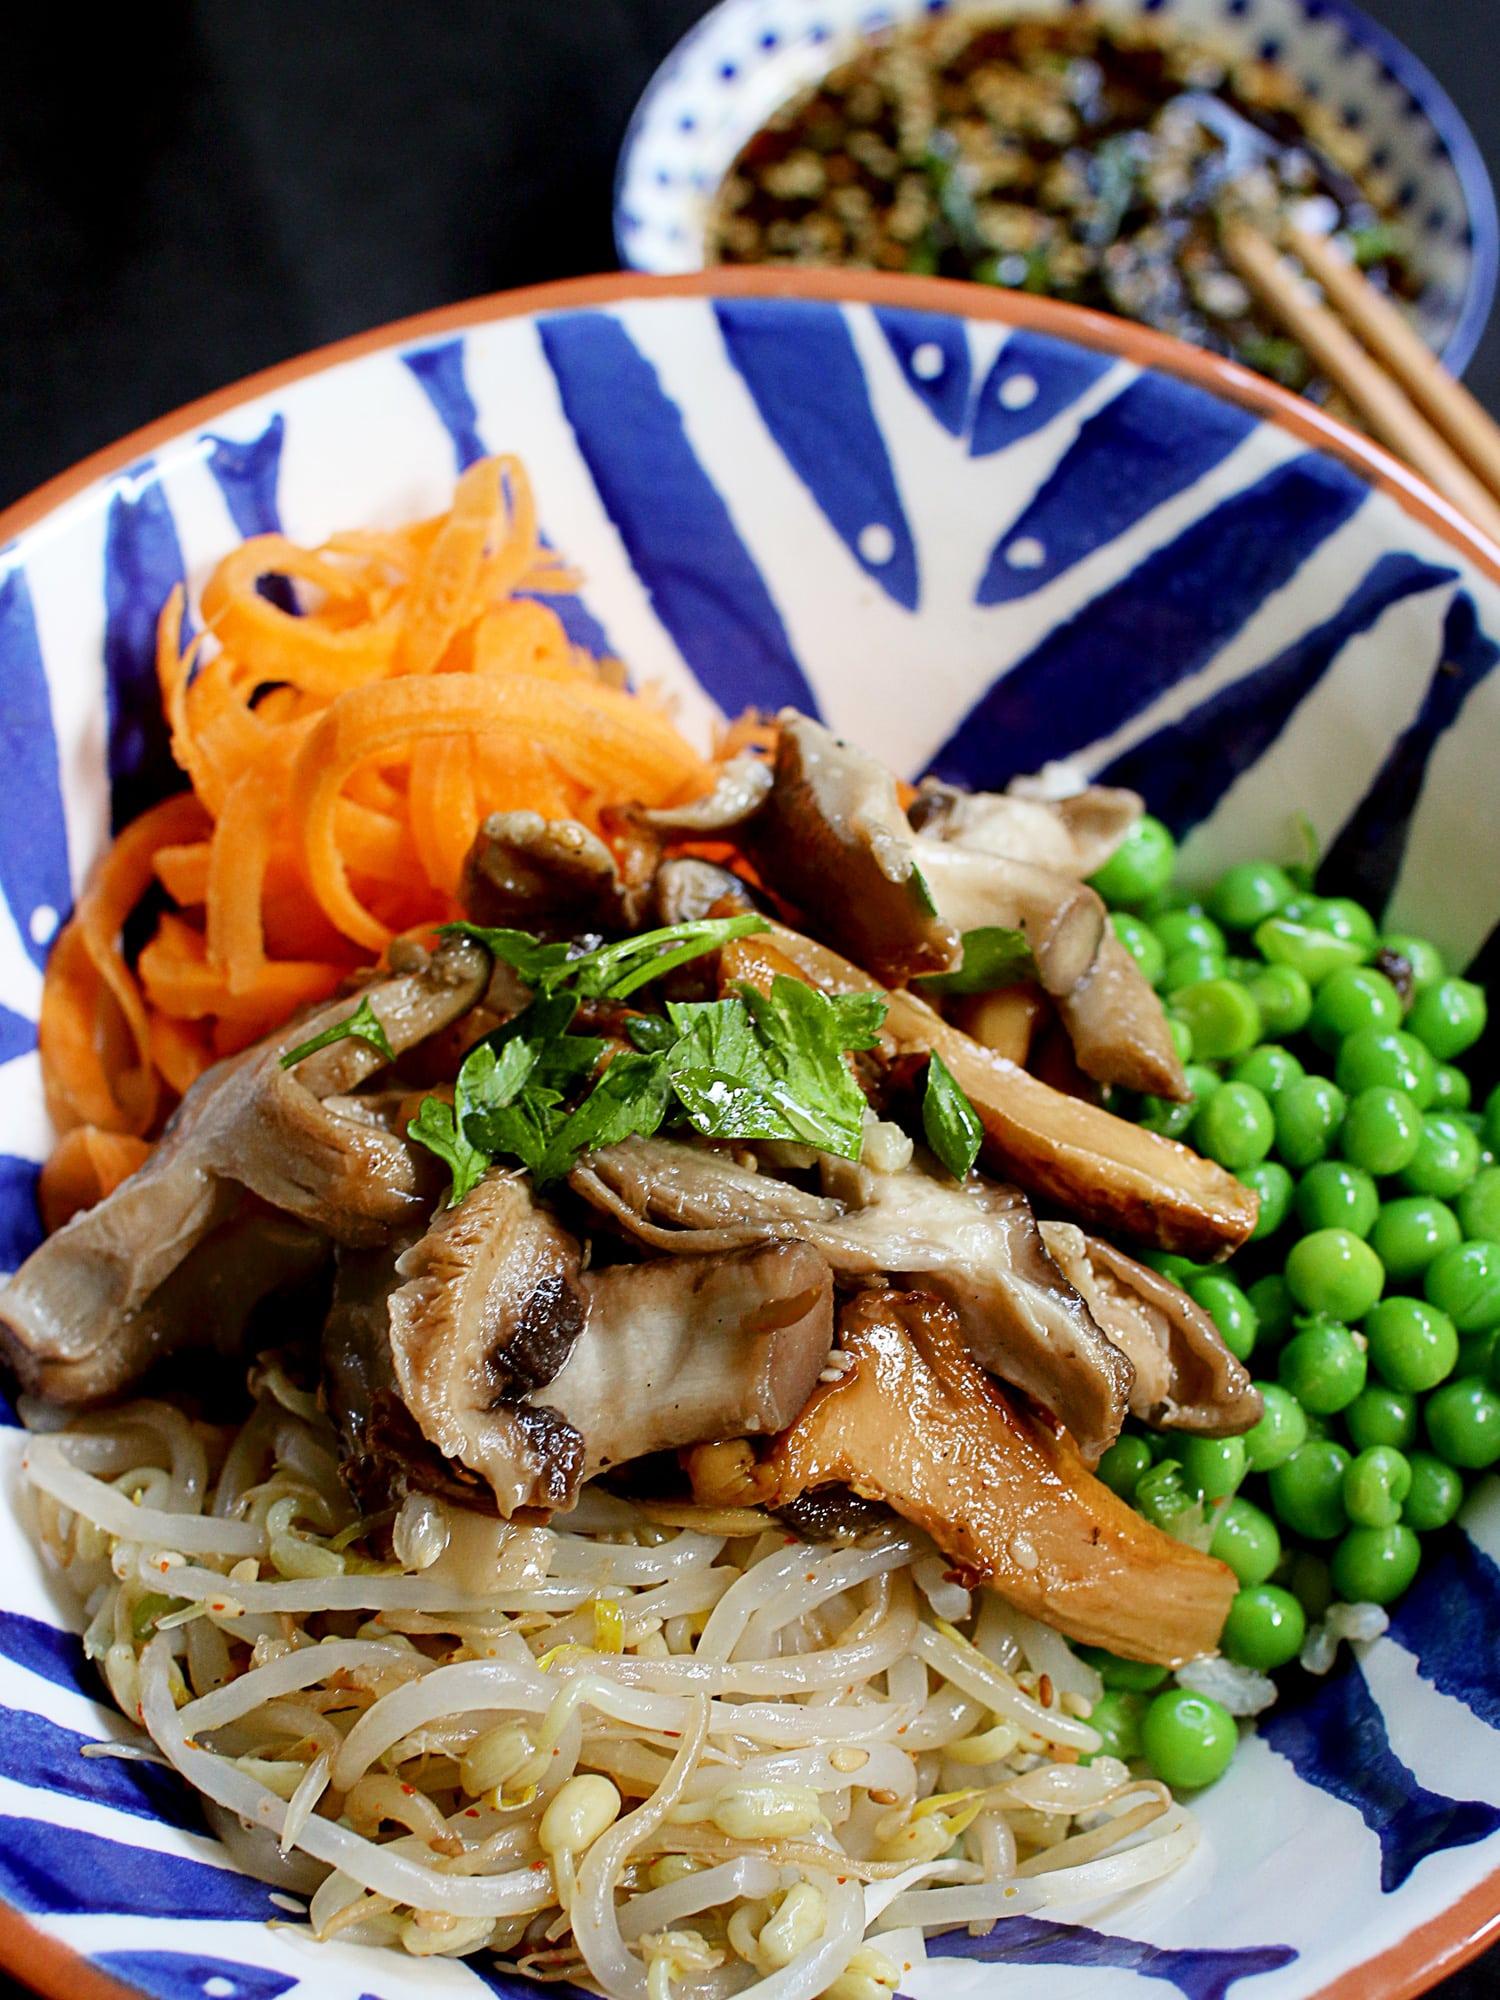 Shitaki mushroom donburi rice bowl 7